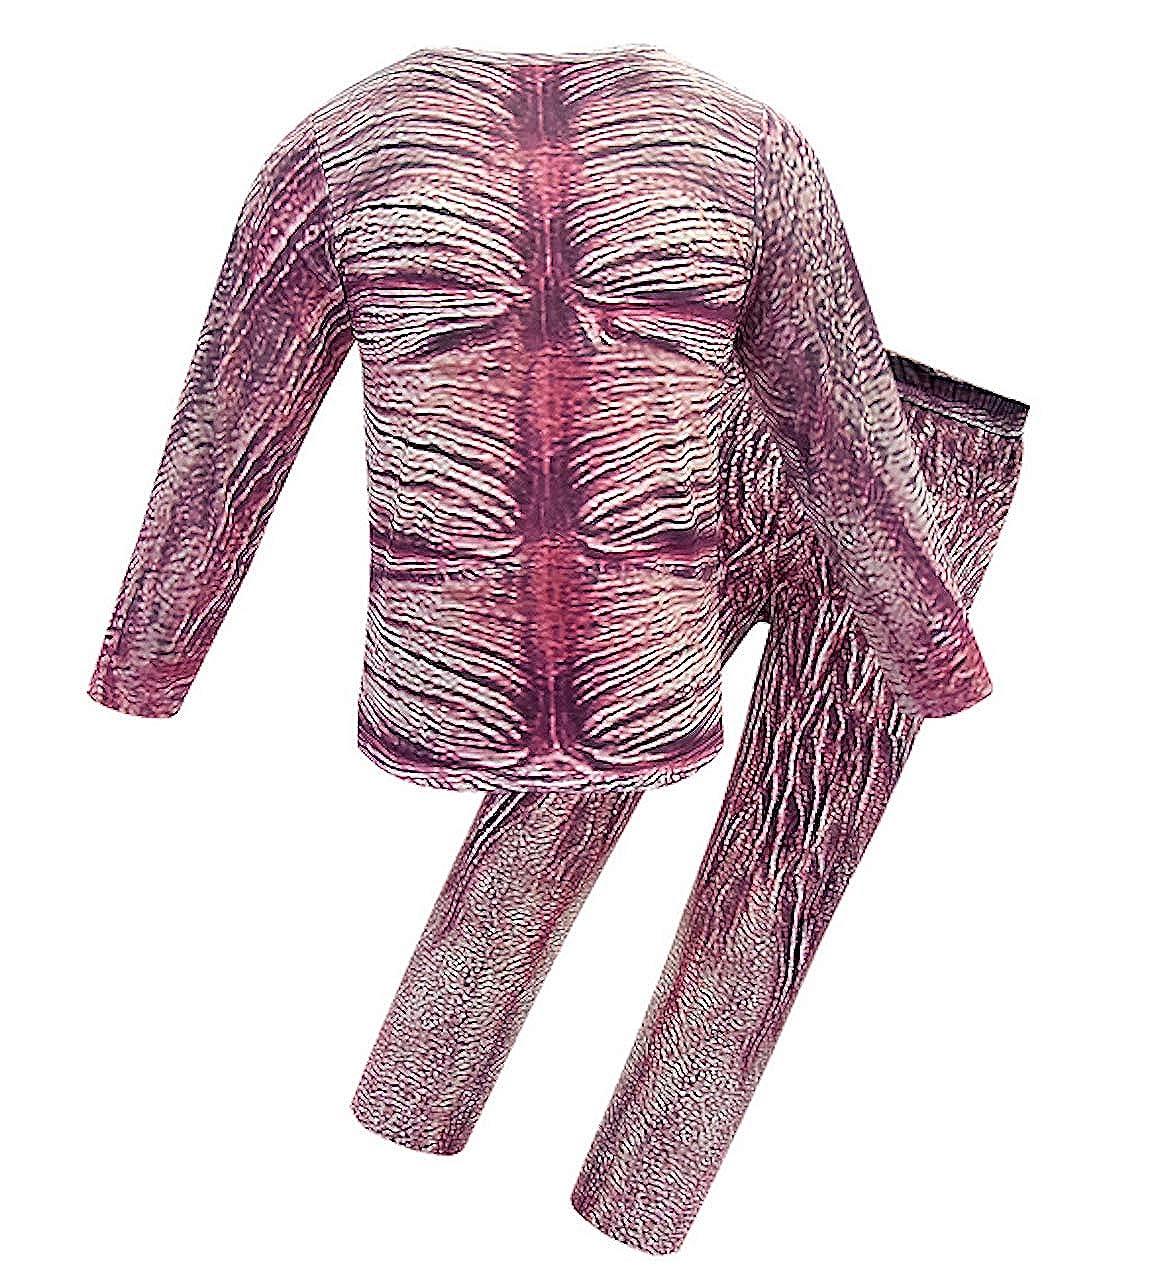 VersusModa Simile Demogorgone Maglia Pantaloni Maschera Bambino Cosplay Stranger Costume Things STRANGE09